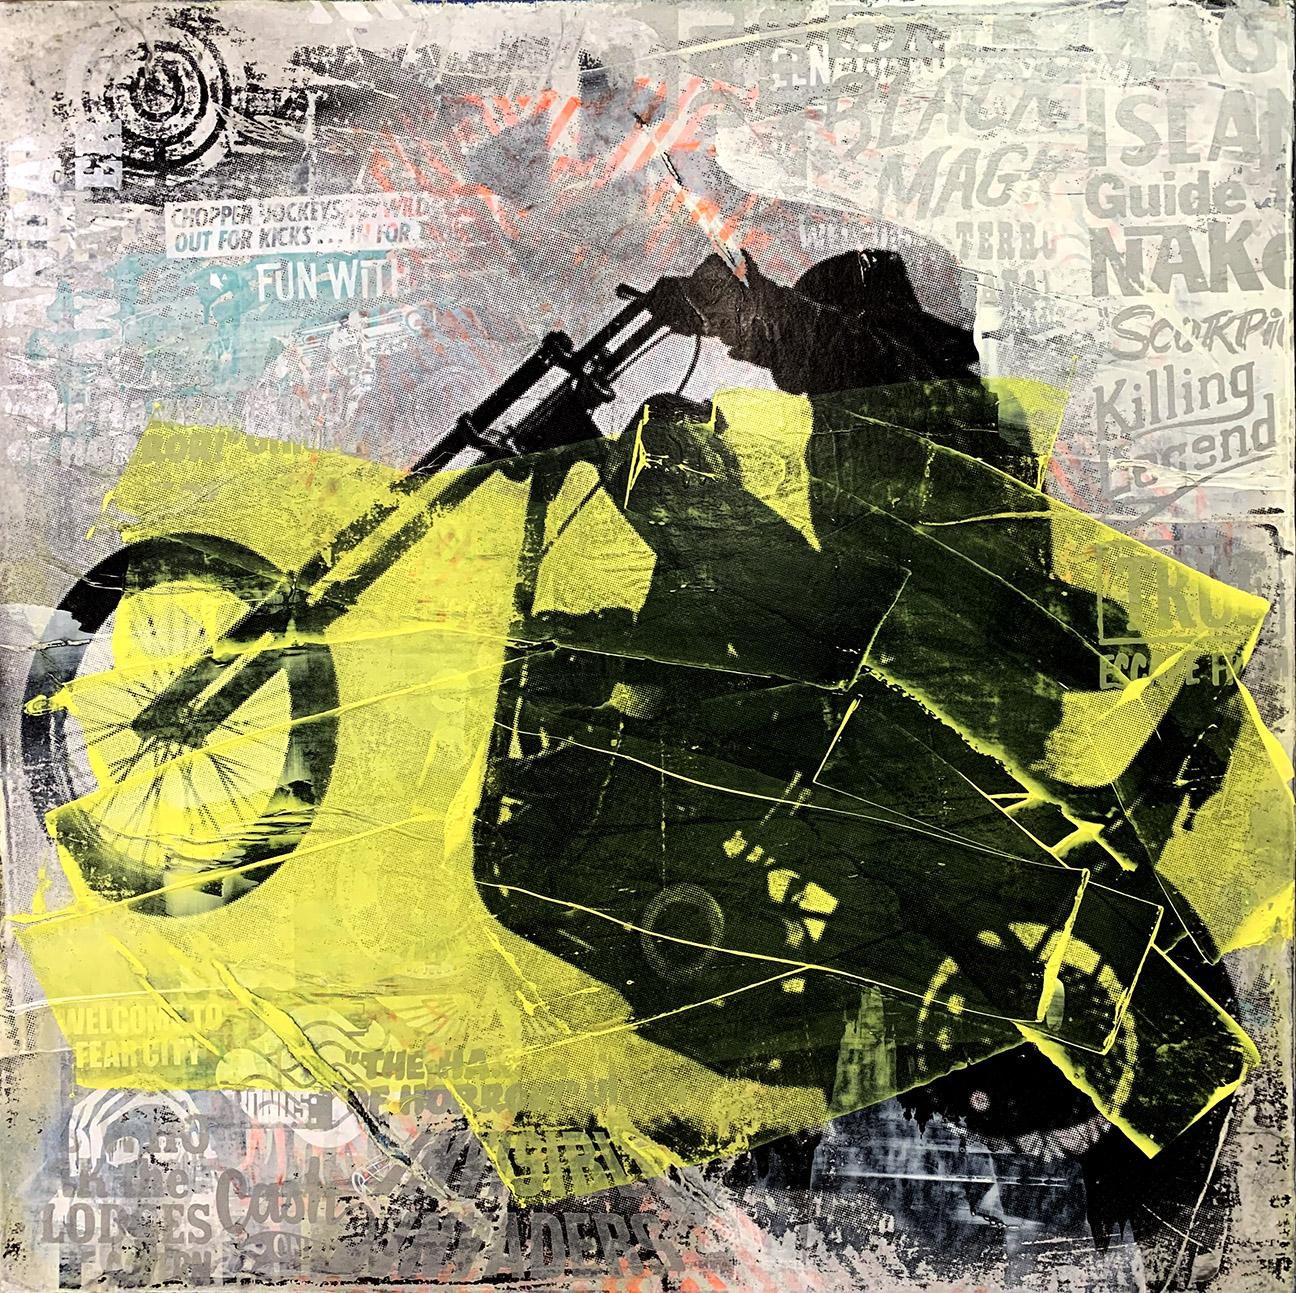 Blk Wheelie_web.jpg